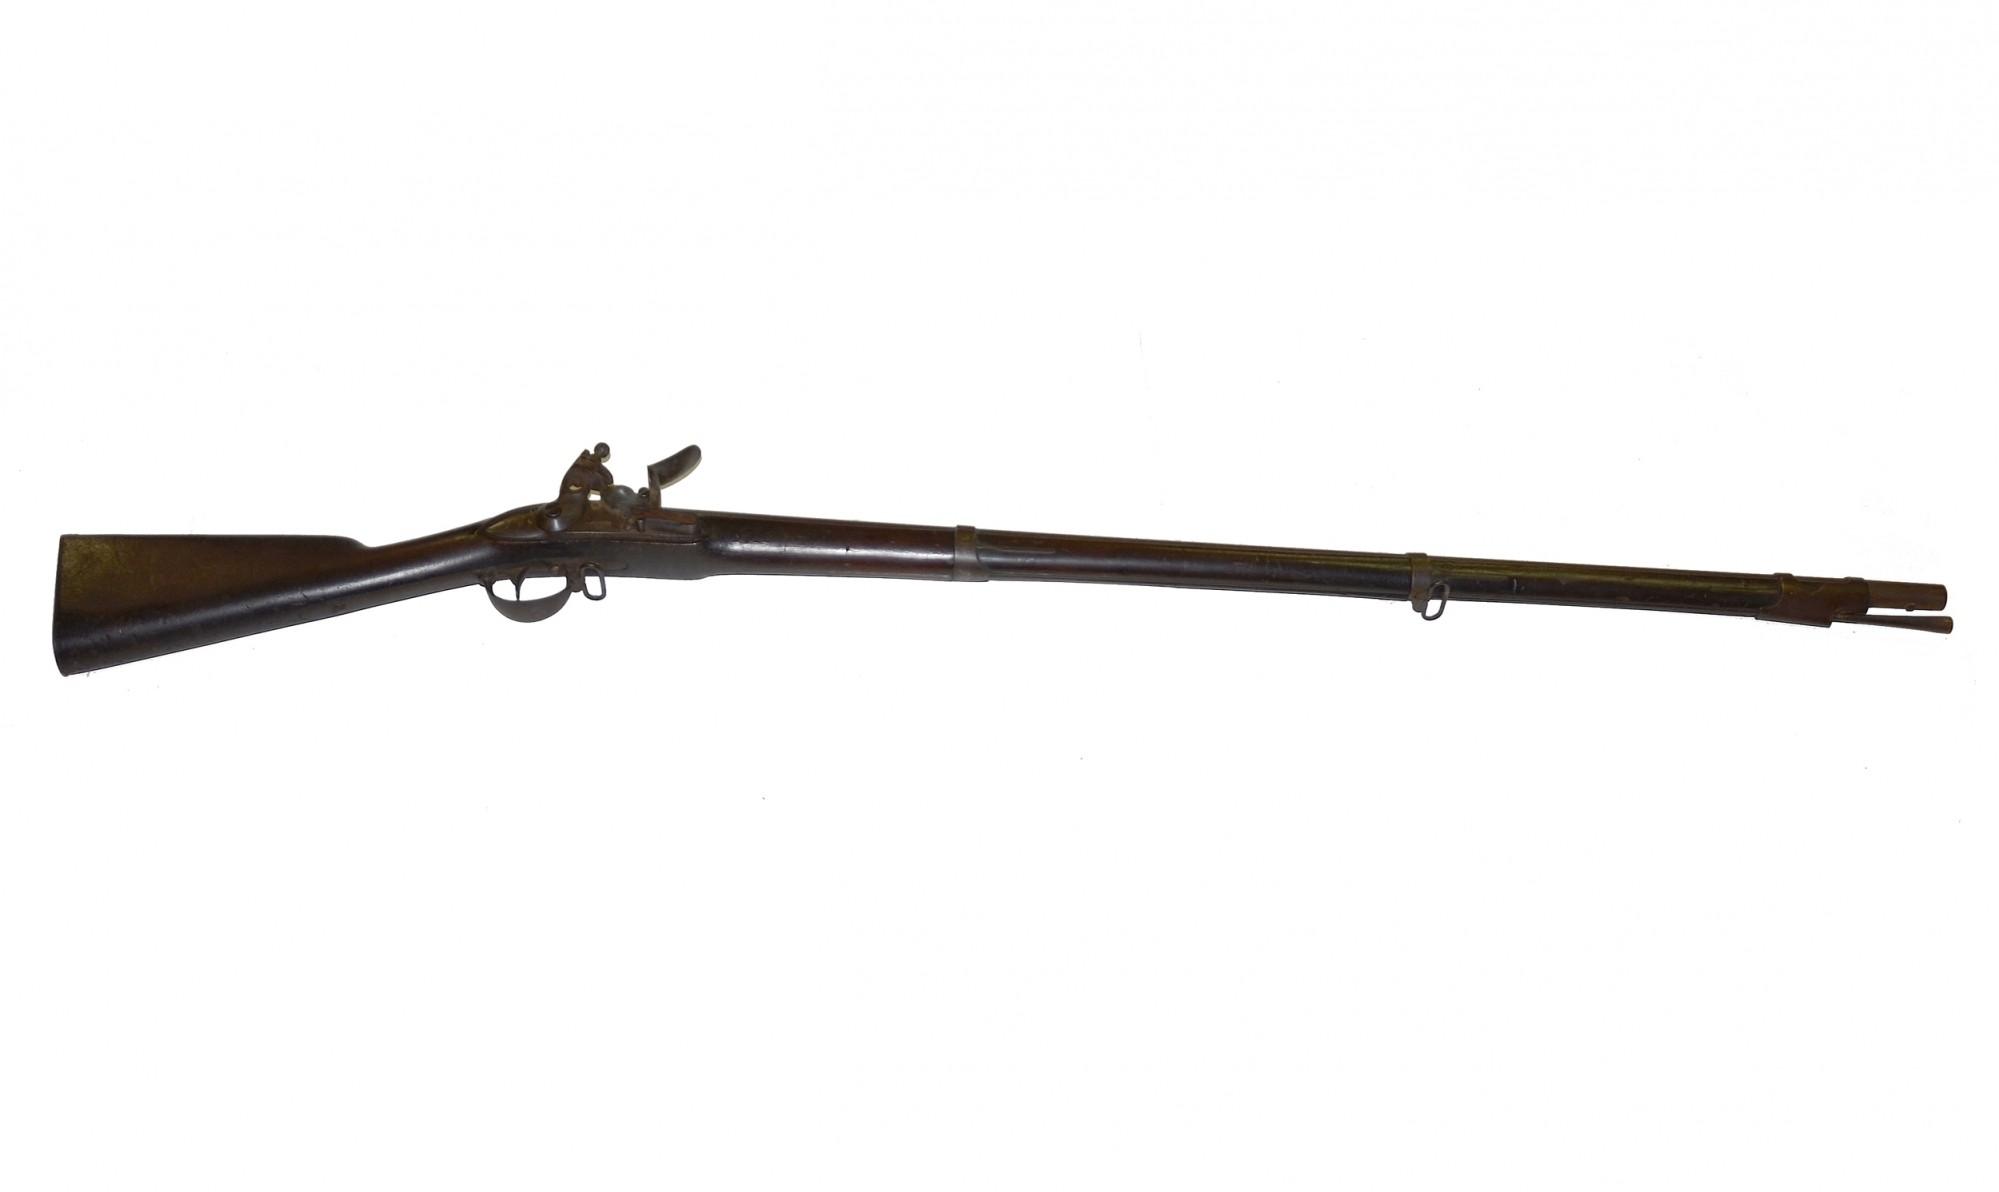 ORIGINAL M1840 RARE, UNALTERED 'D. NIPPES' FLINTLOCK